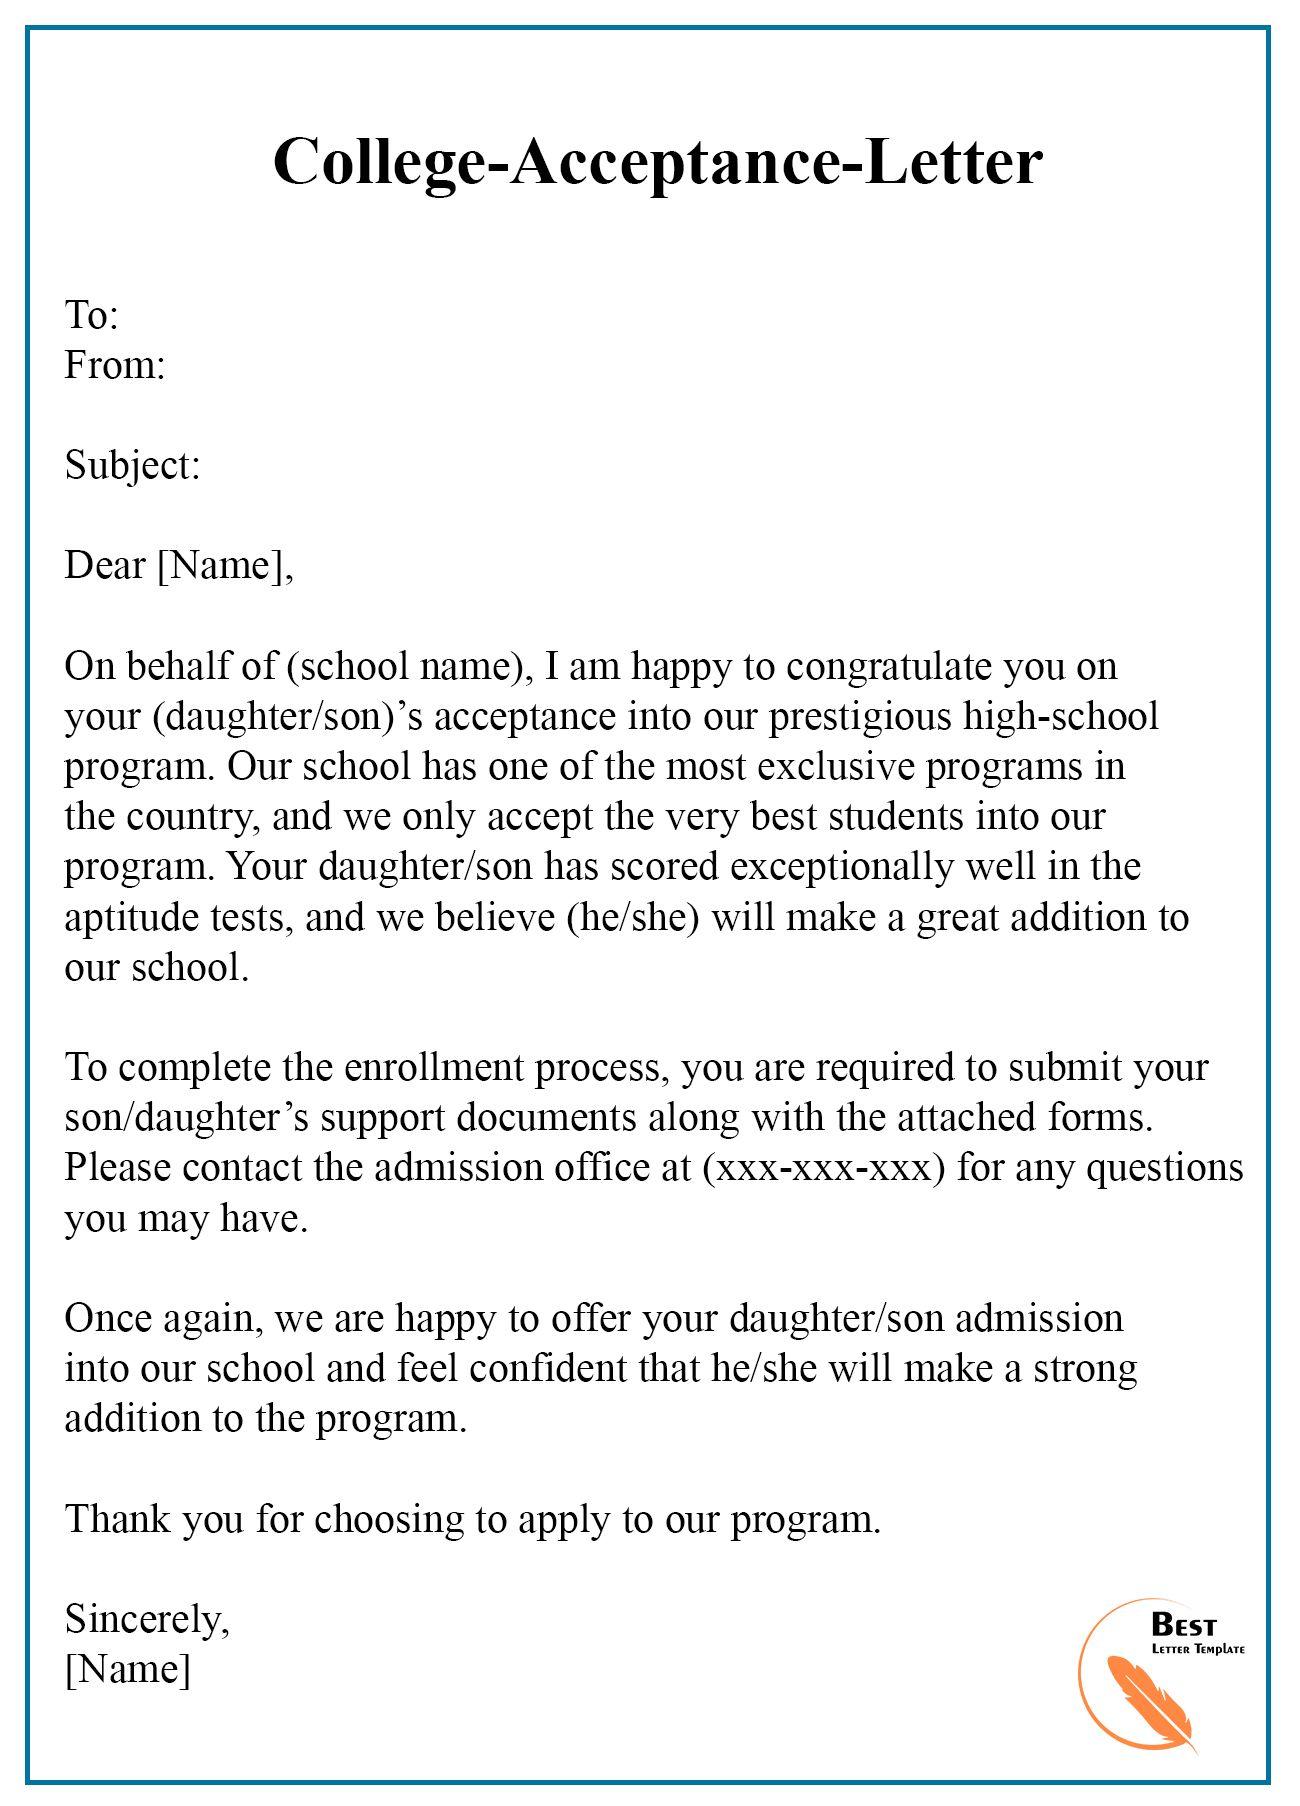 College Acceptance Letter Template Format, Sample